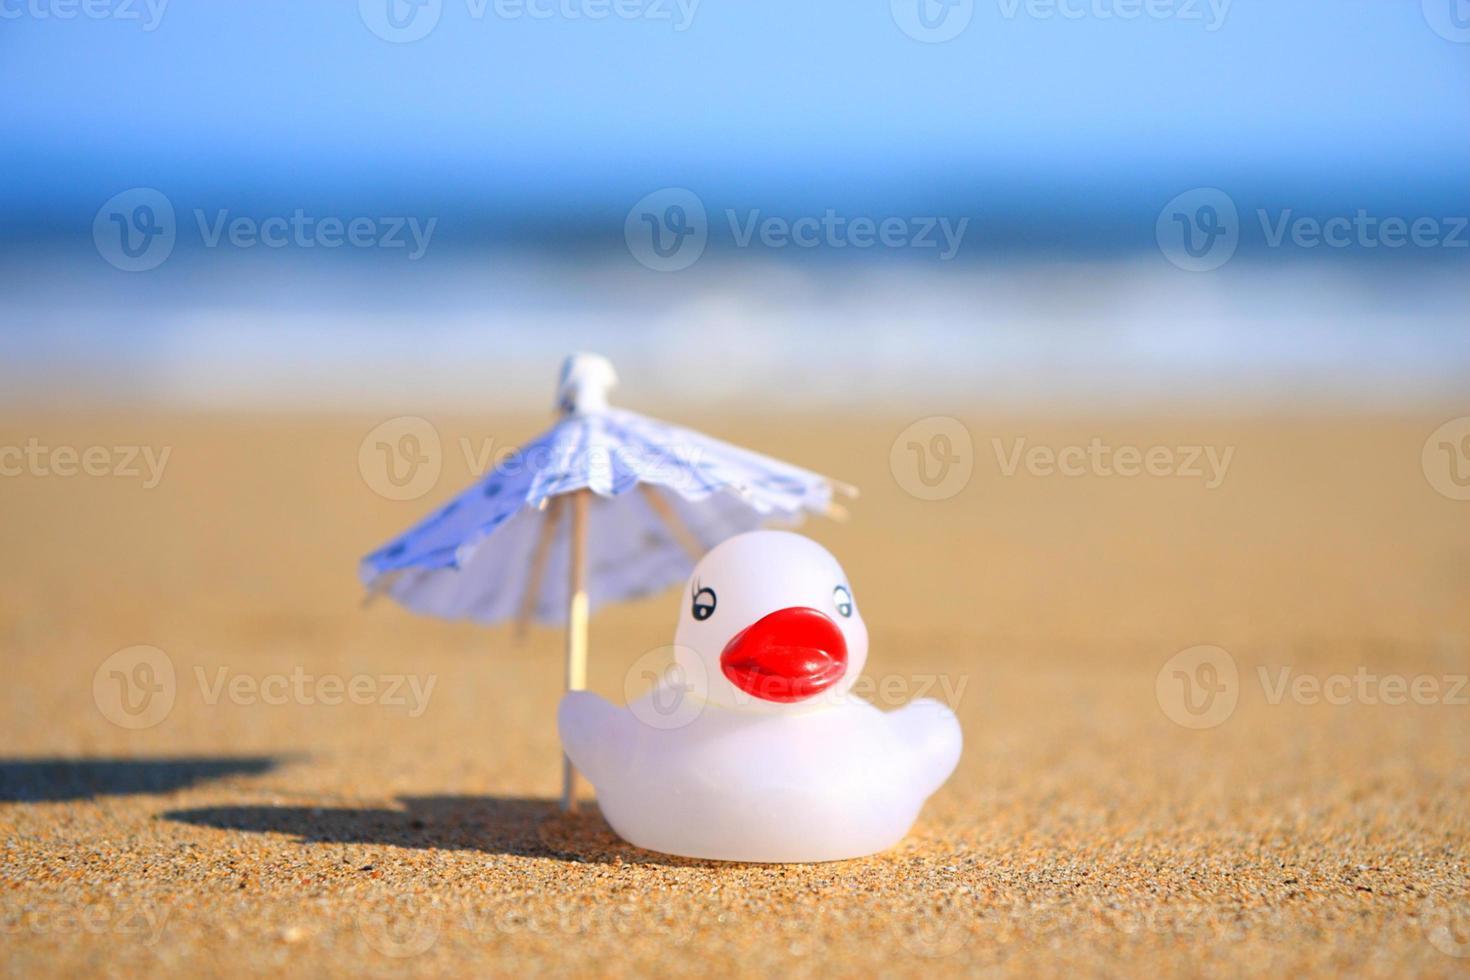 White parasol & duck photo